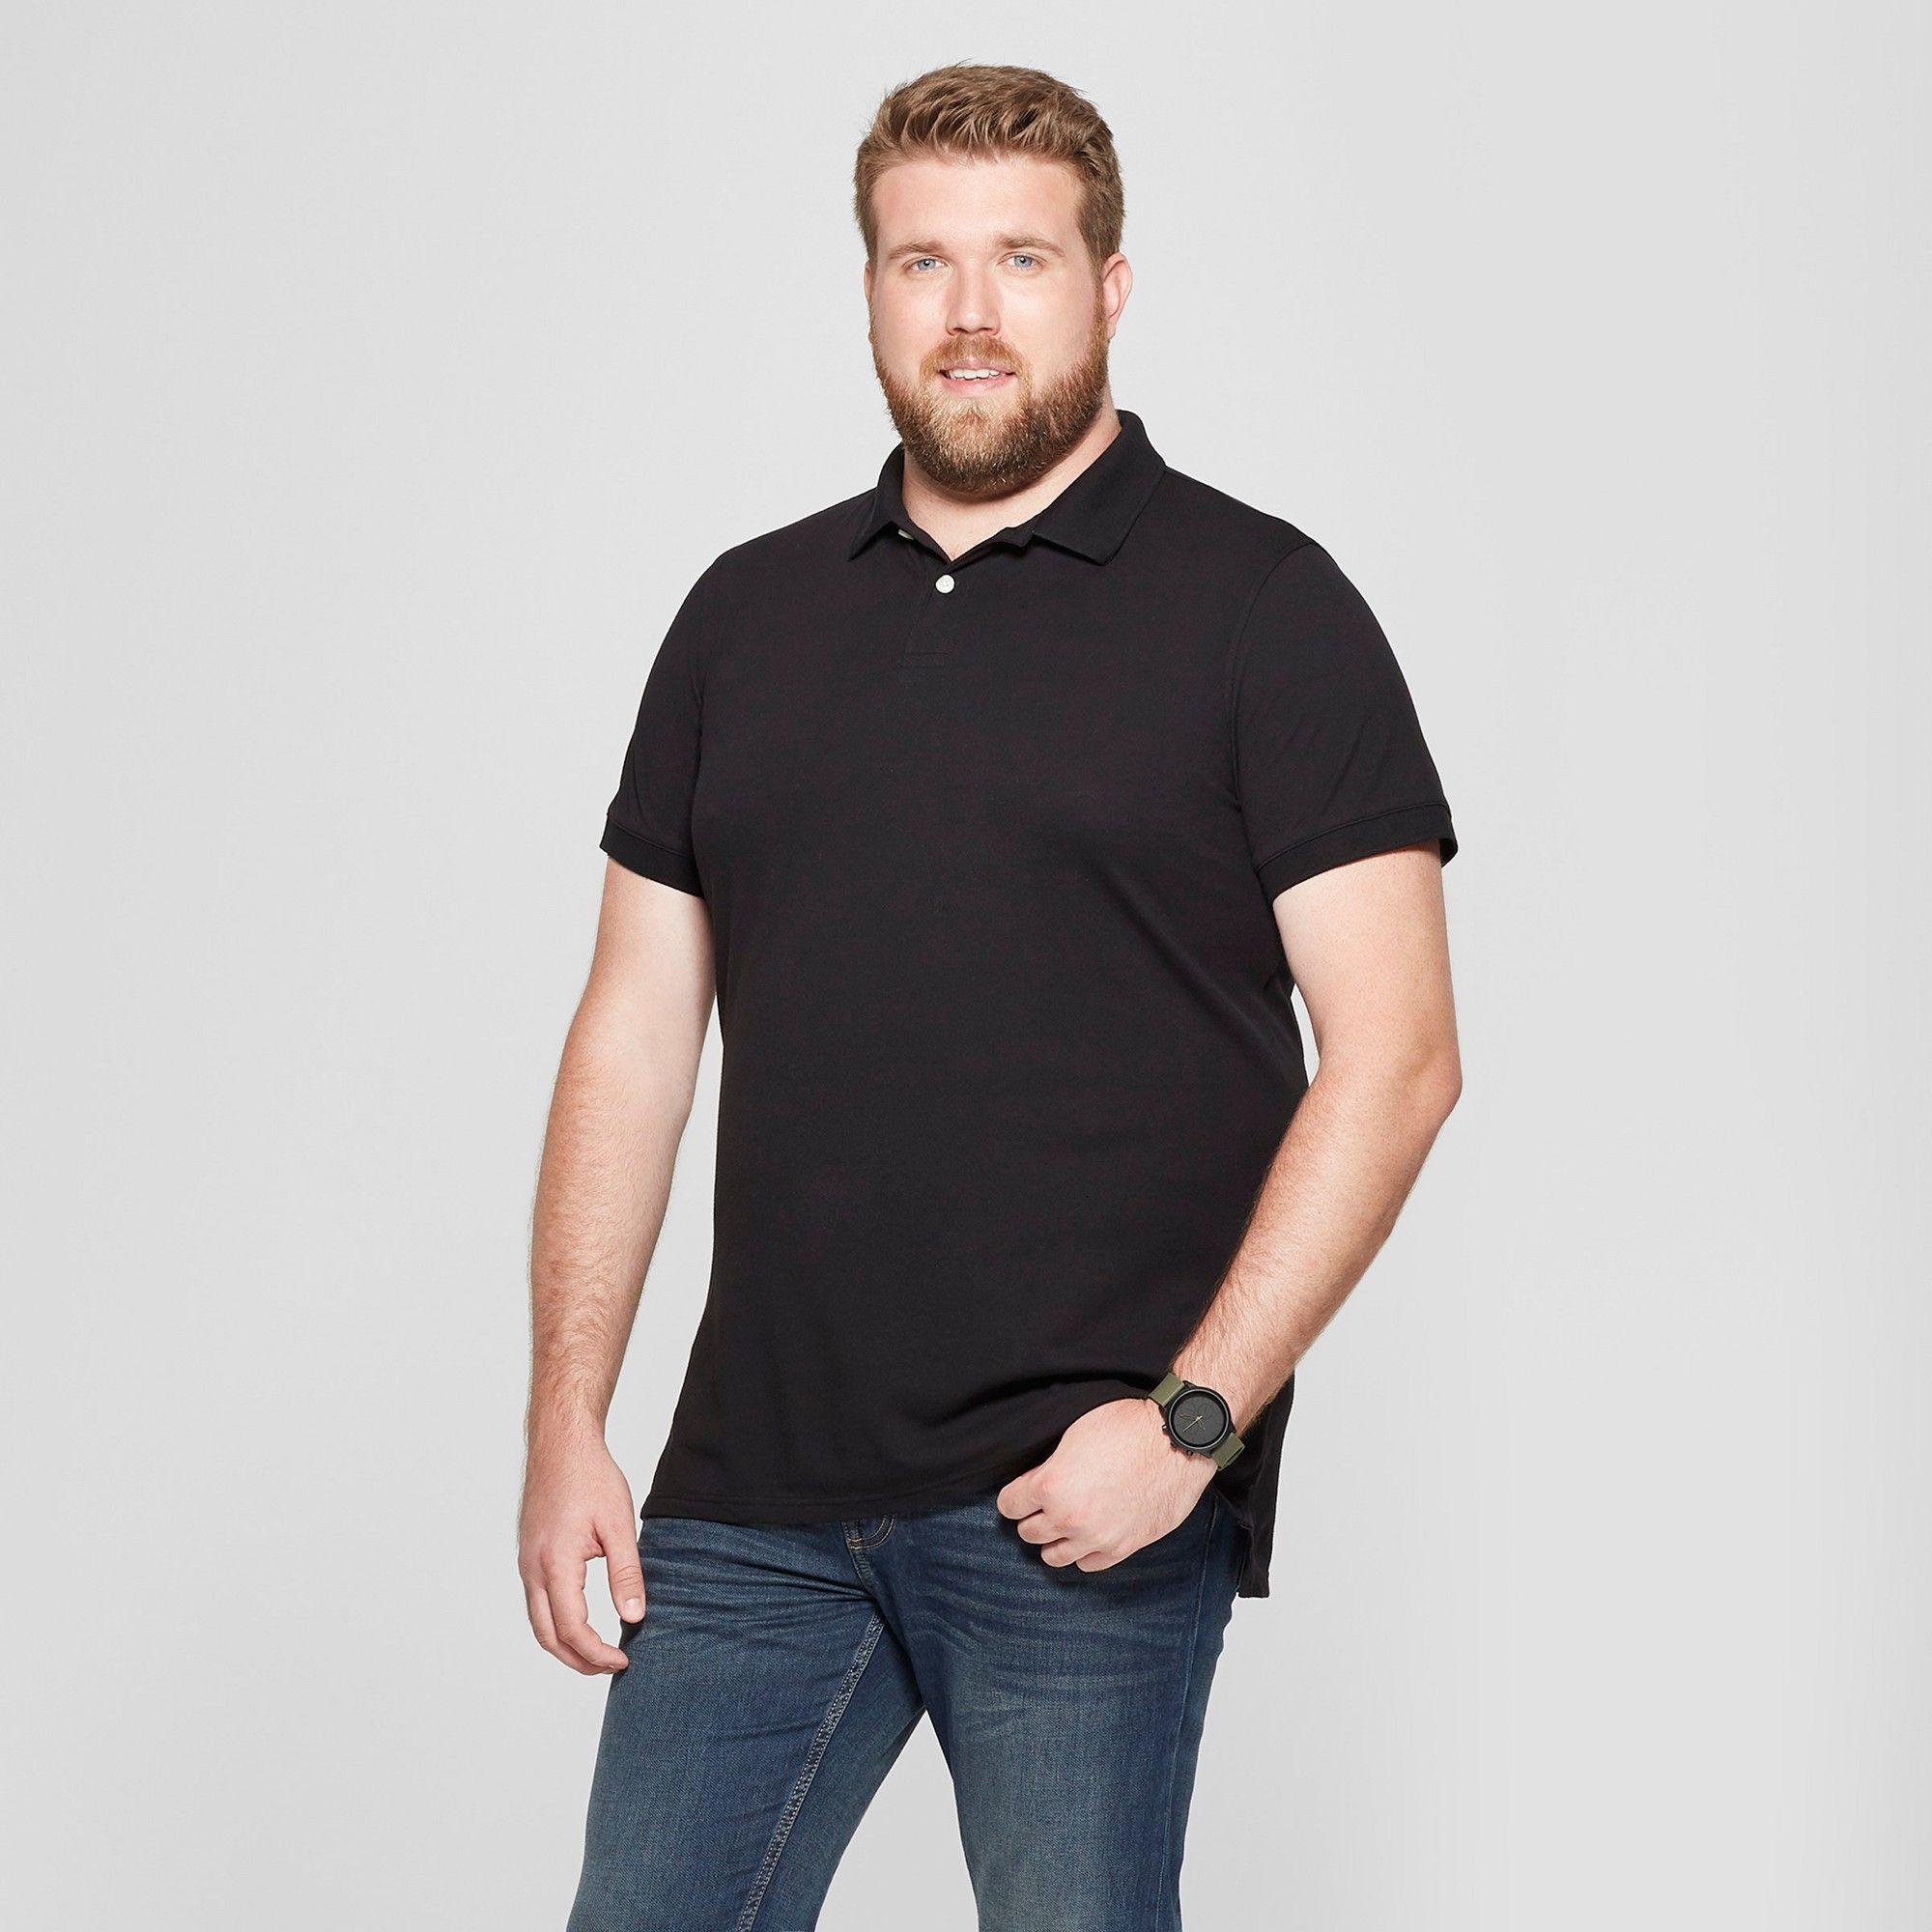 Men's Tall Short Sleeve Collared Loring Polo T-Shirt - Goodfellow ...